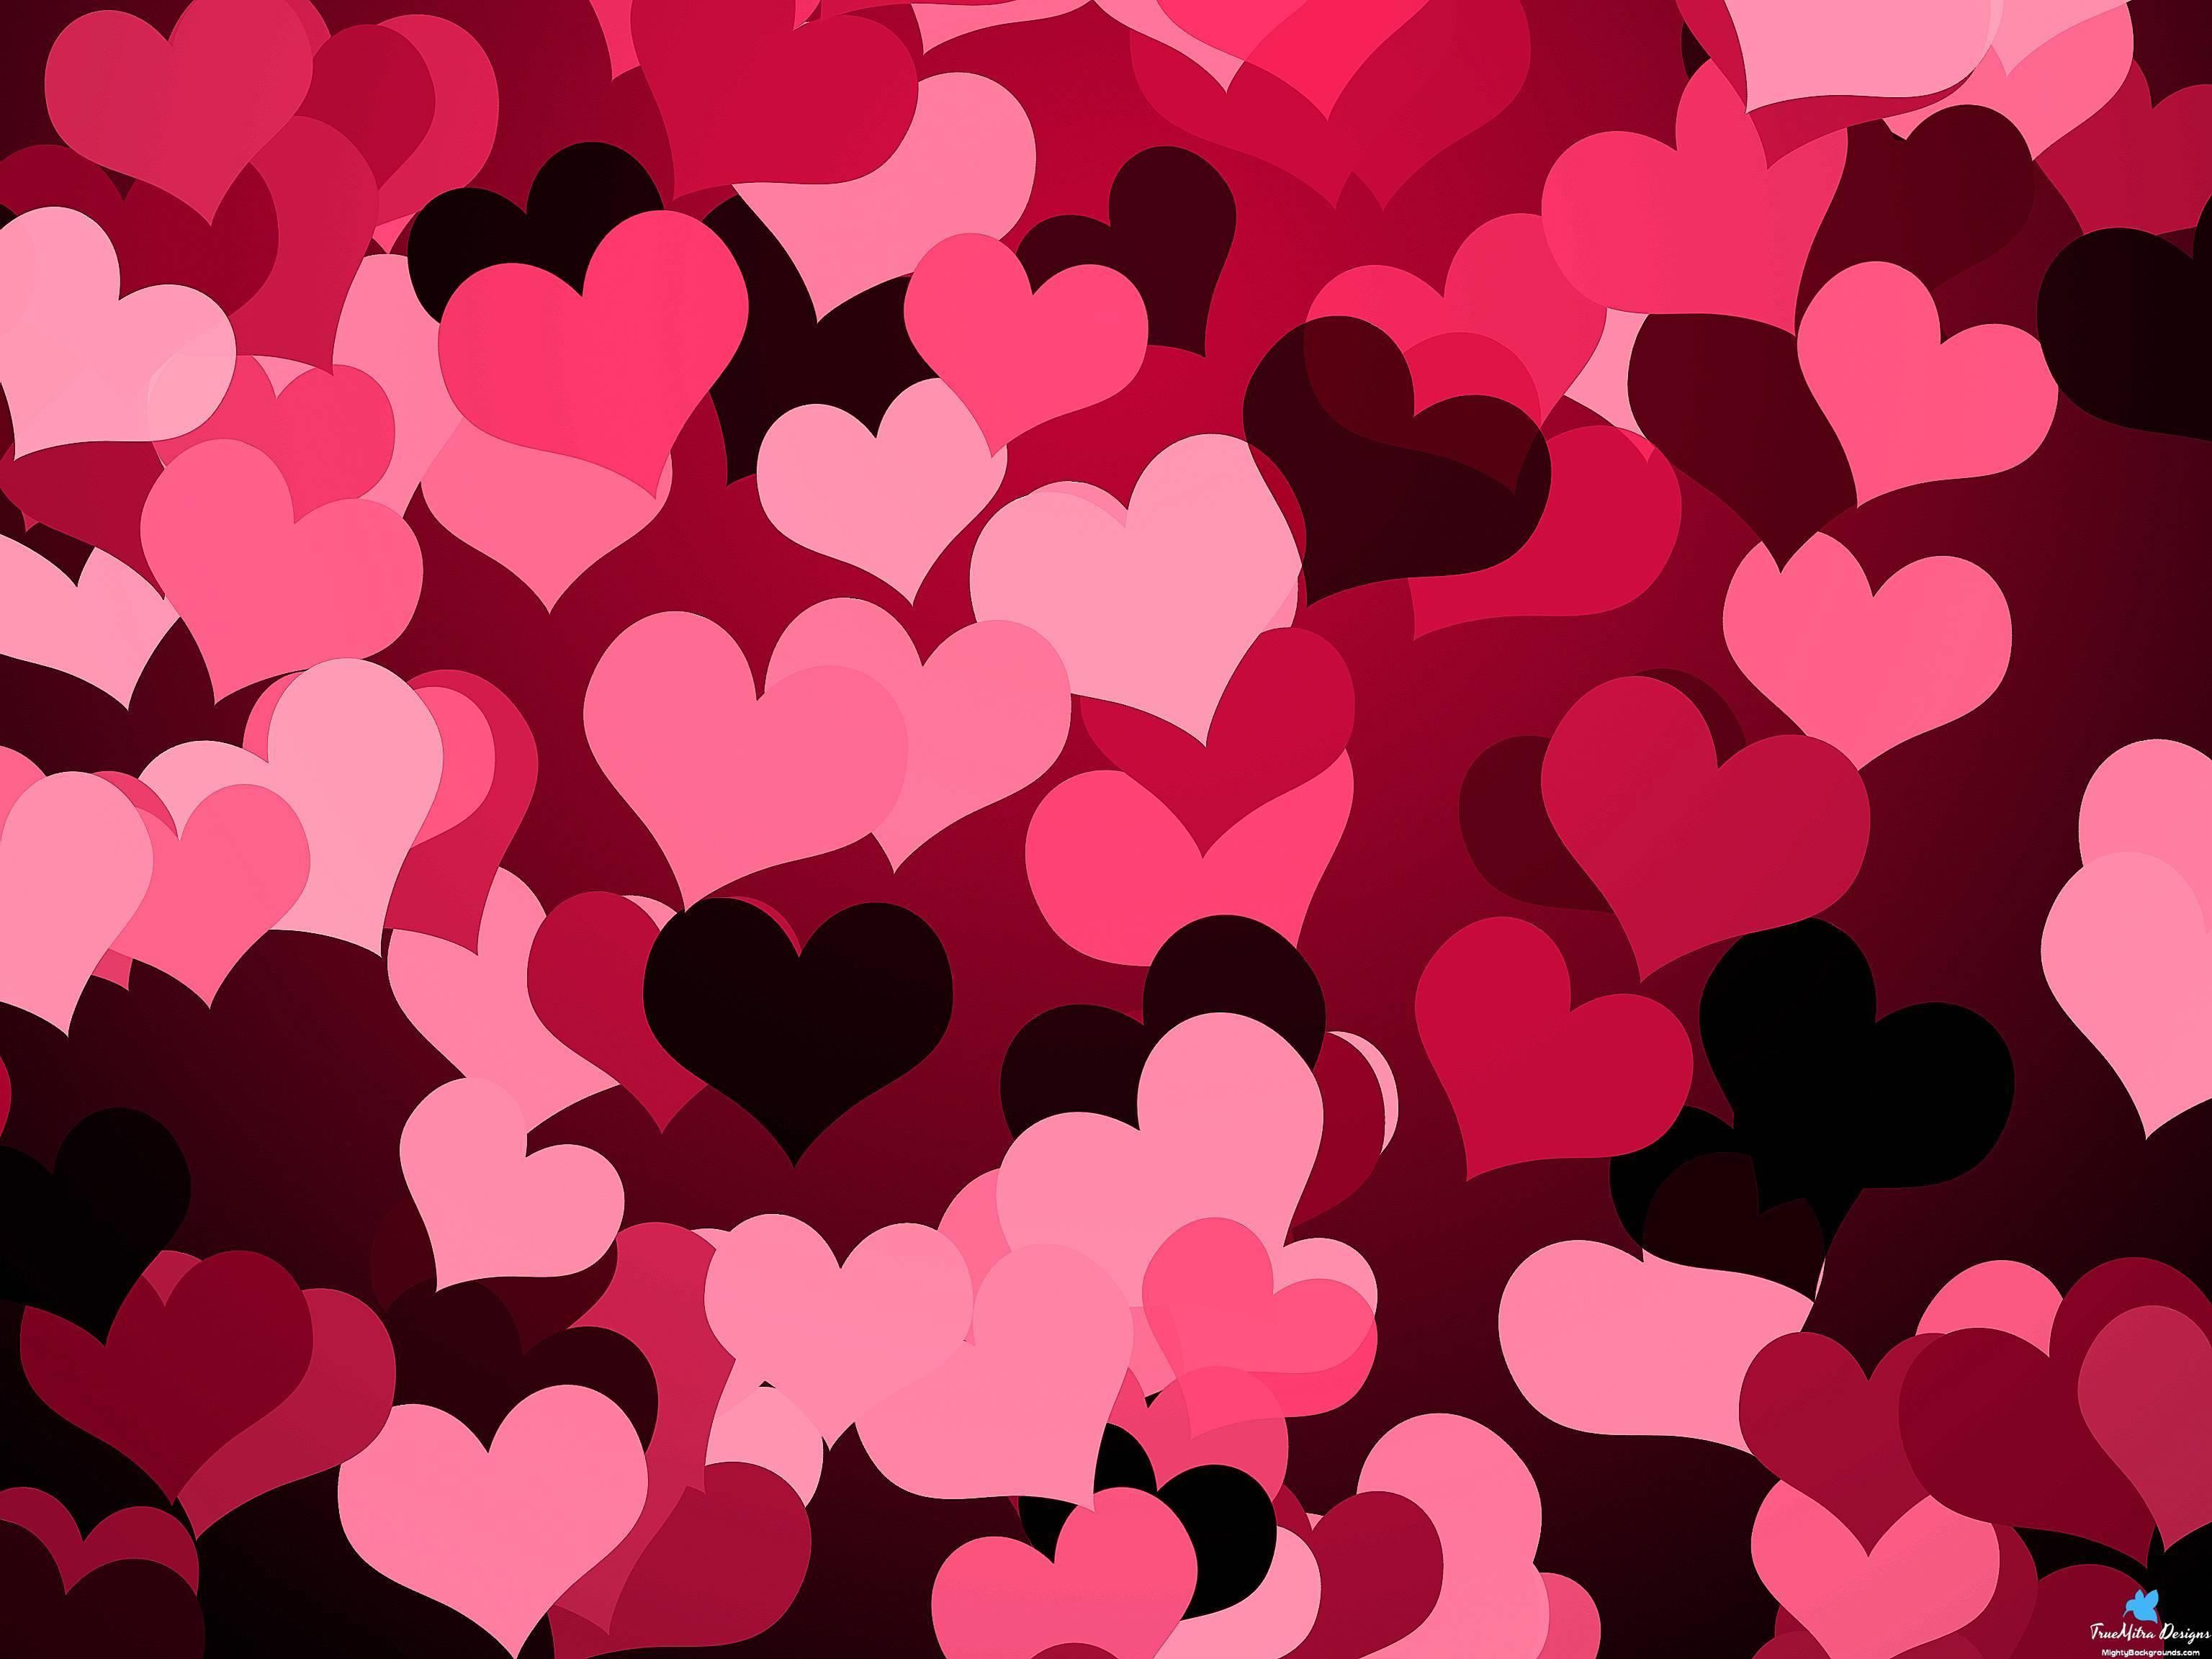 Hearts Jpg Wallpaper PPT Backgrounds